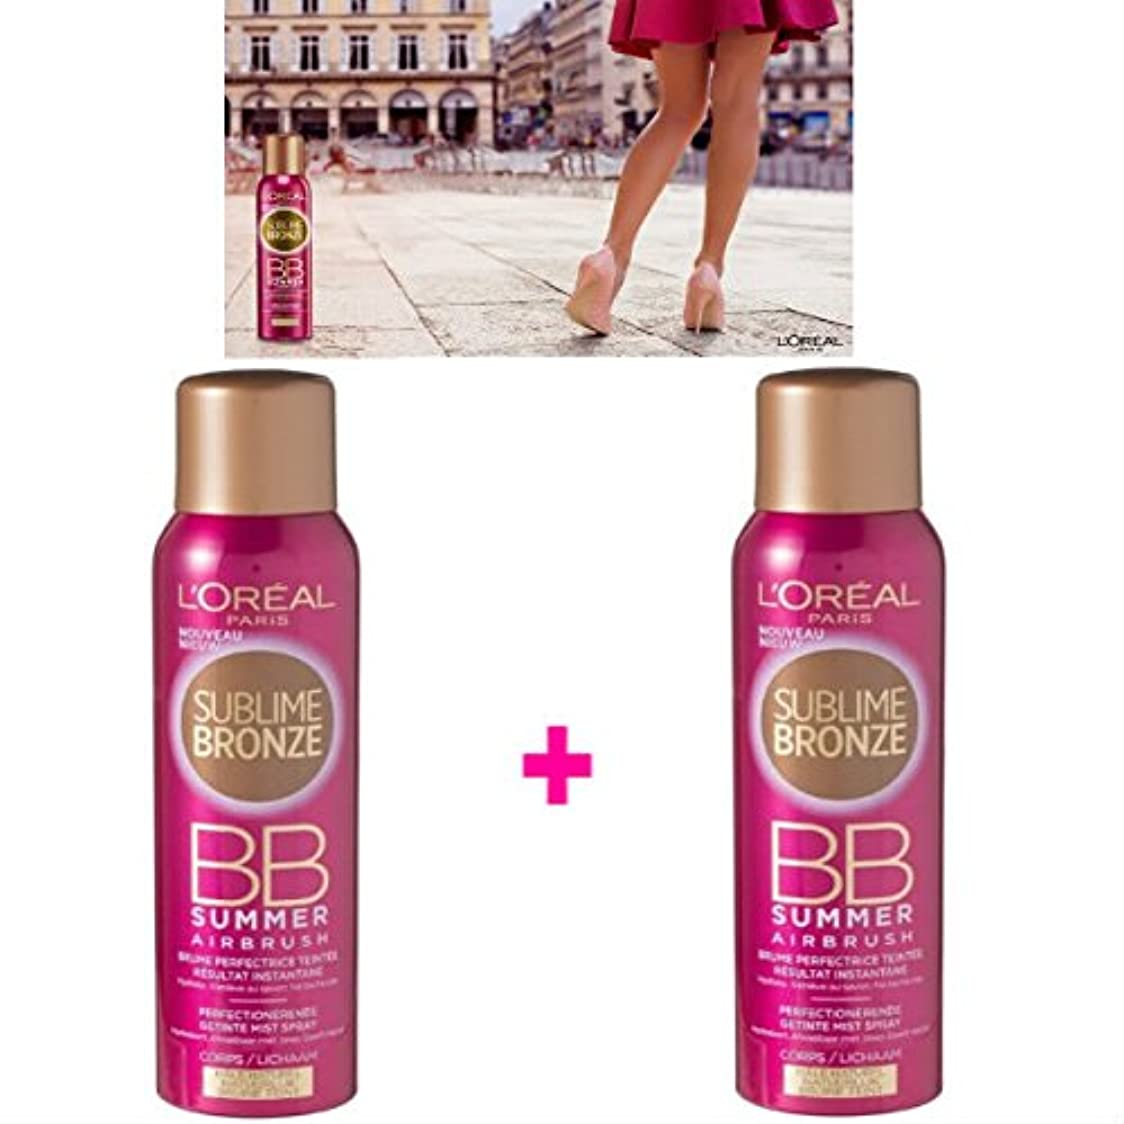 無知故国信頼できるL 'Oréal Paris Nebel Tint ohne Selbstbräuner Körper (2 x 150 ml) (Lot de 2 Produkte)